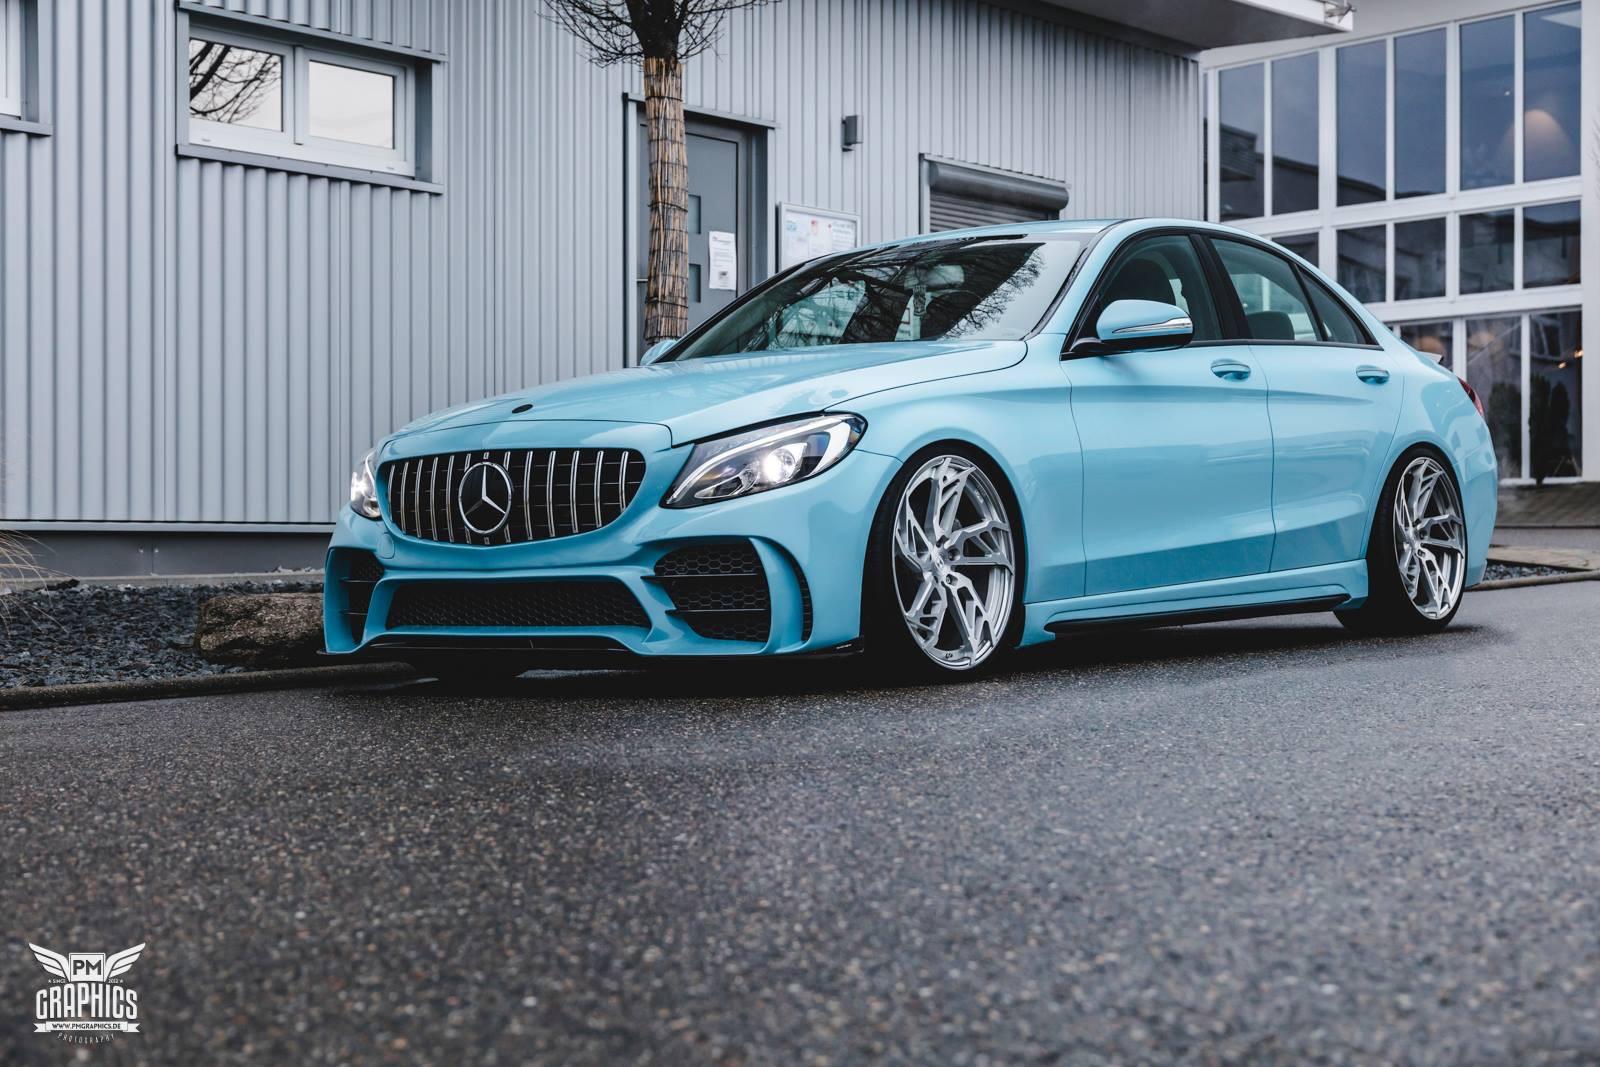 Mercedes-Benz C W205 SR66-R body kit